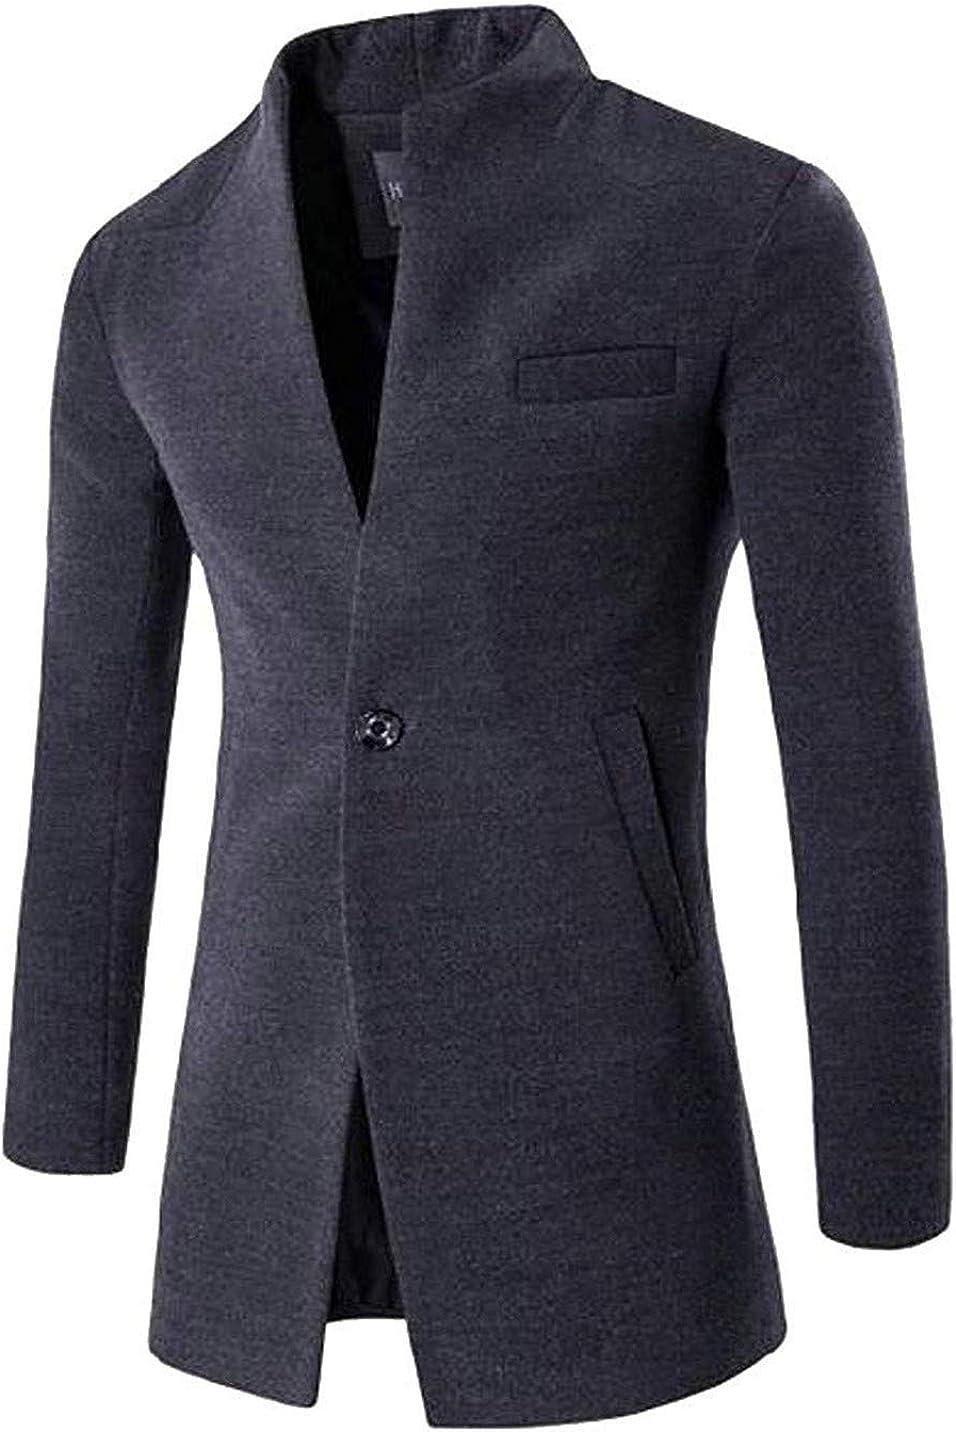 Mens Single Breasted Vogue Wool Blend Slim Fit Overcoat Trenchcoat Pea Coat